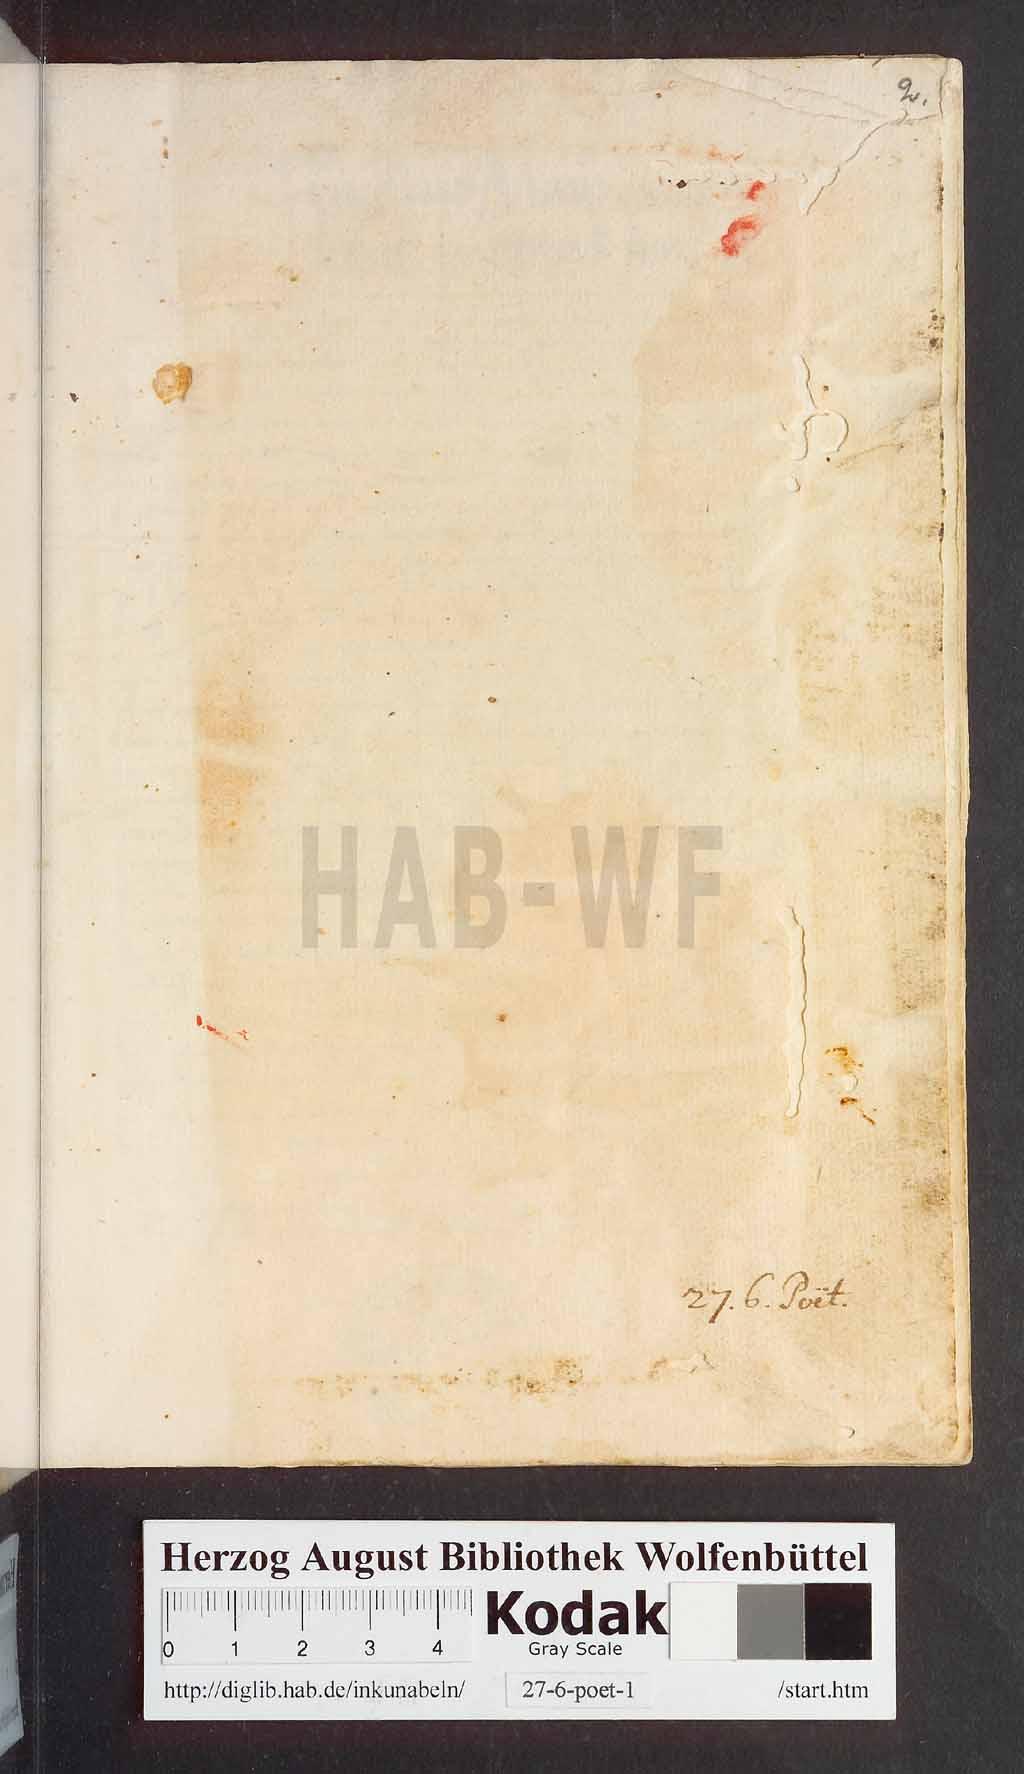 http://diglib.hab.de/mss/27-6-poet-1/00001.jpg